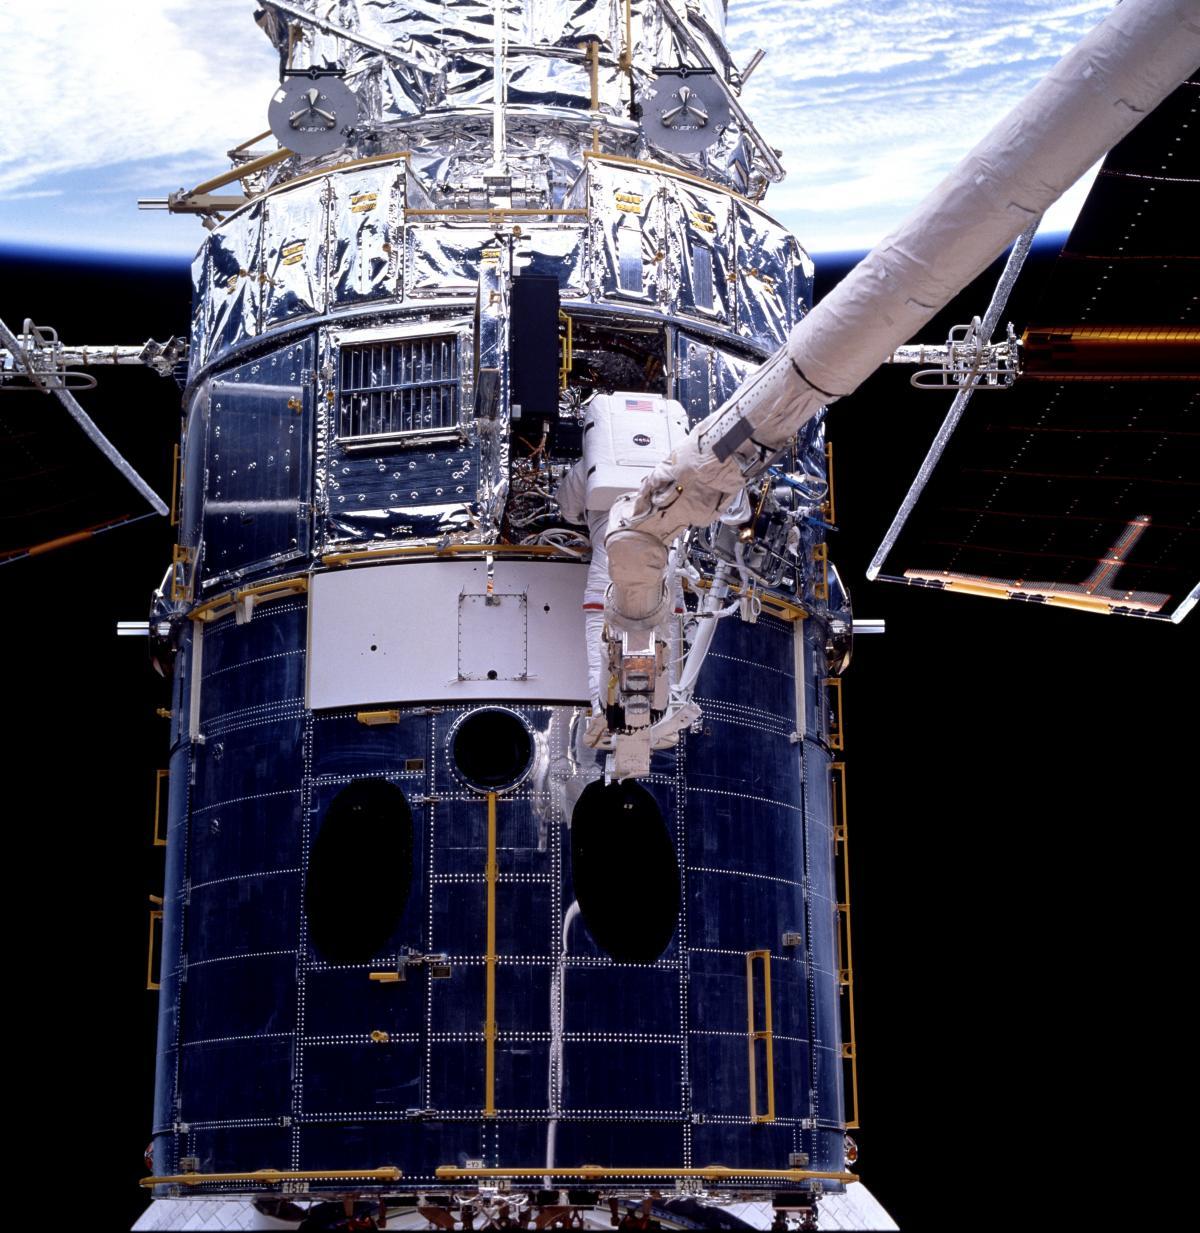 EVA 3 activity on Flight Day 6 to service the Hubble Space Telescope